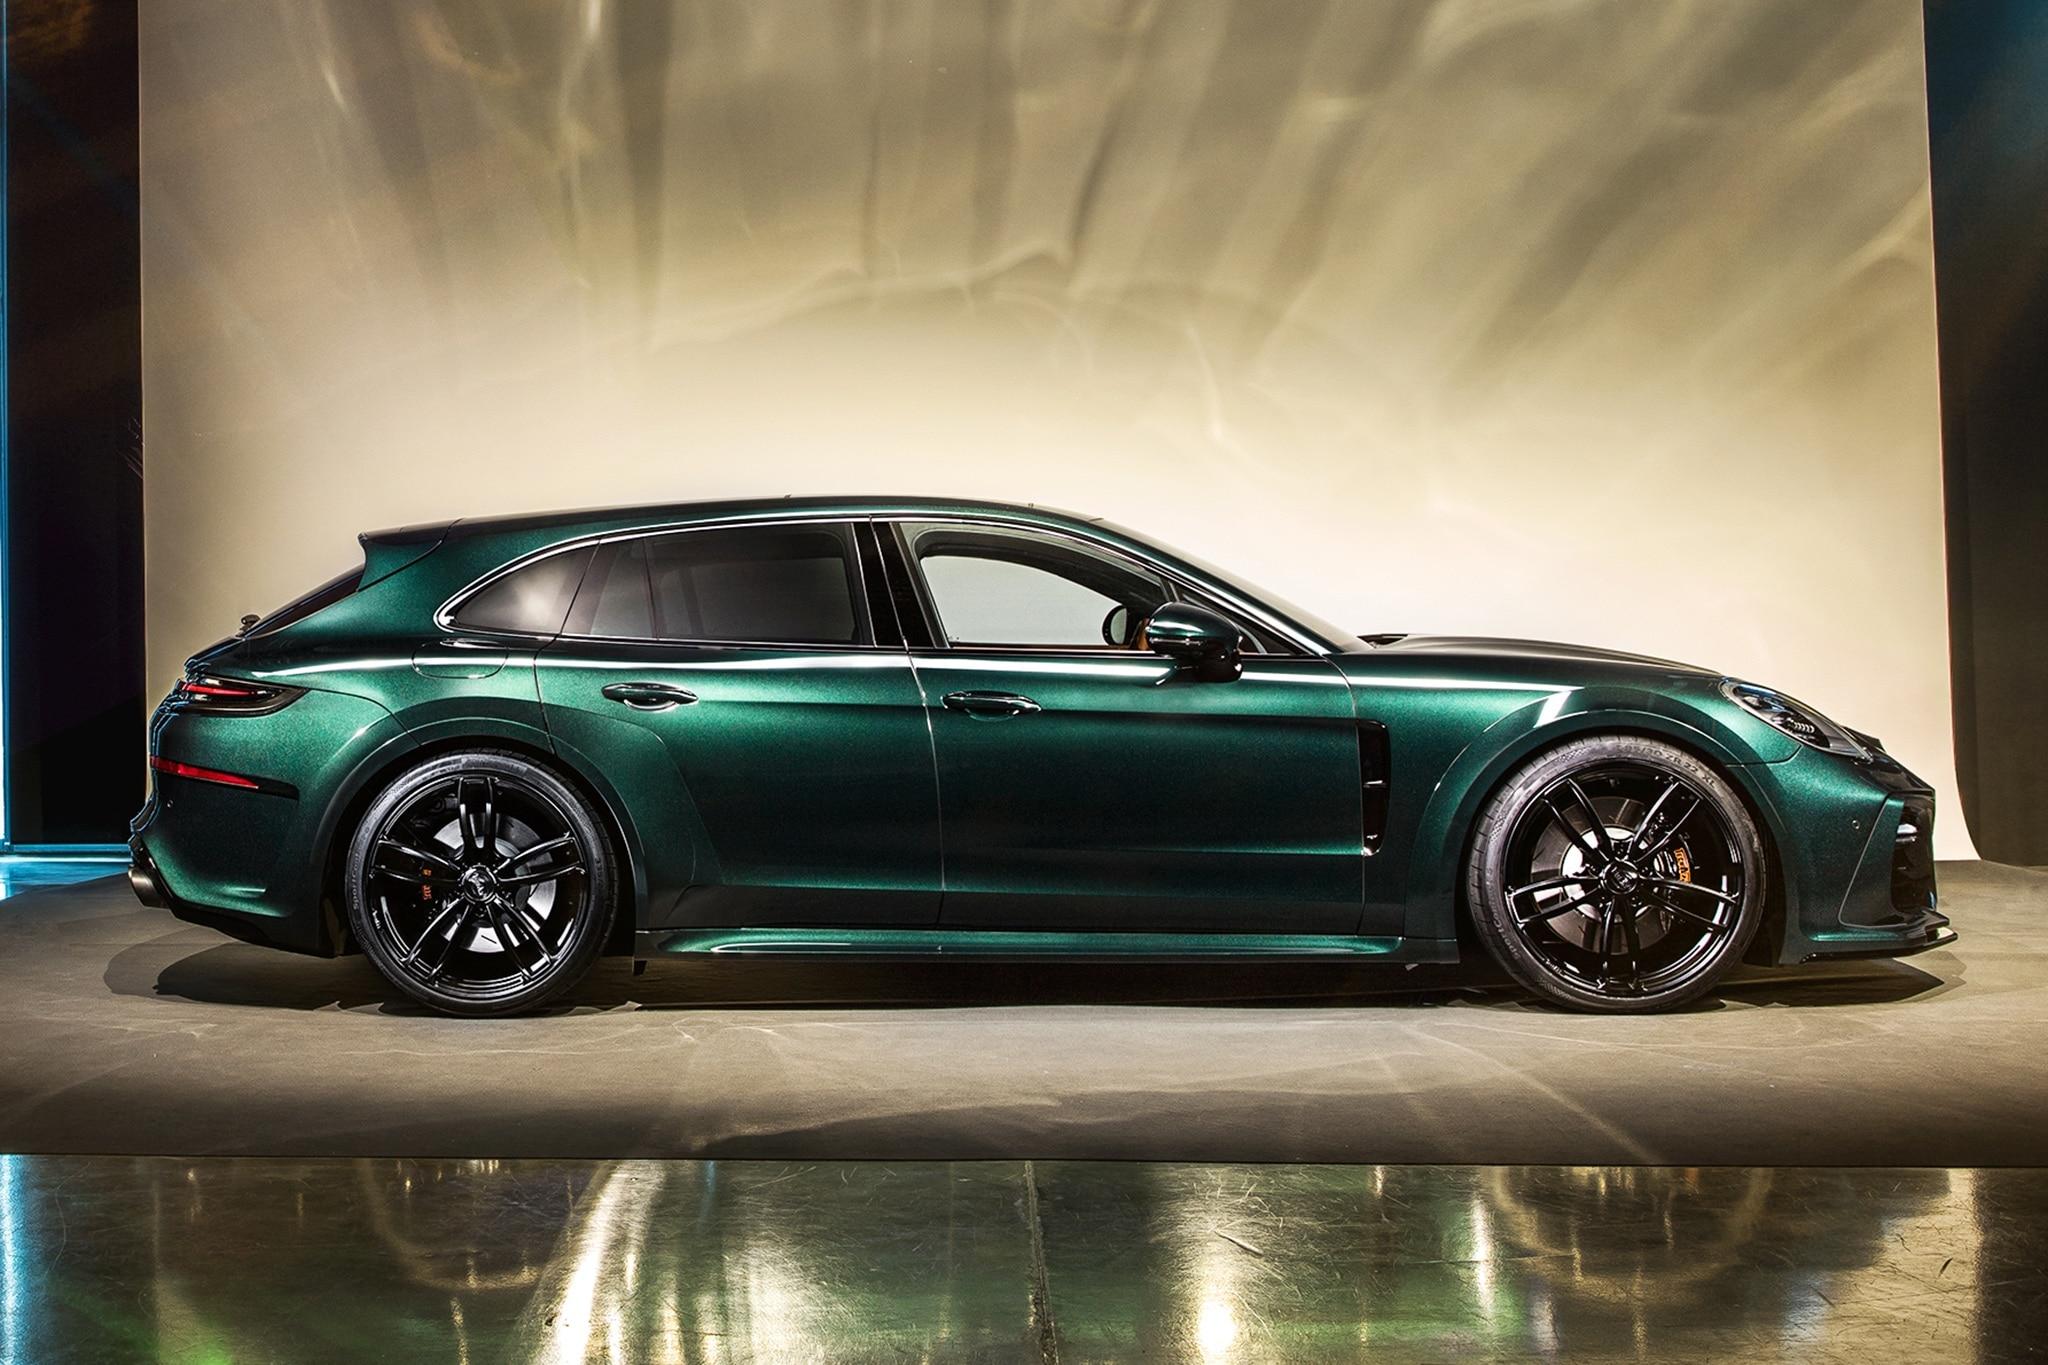 Techart S Porsche Panamera Sport Turismo Makes 640 Hp